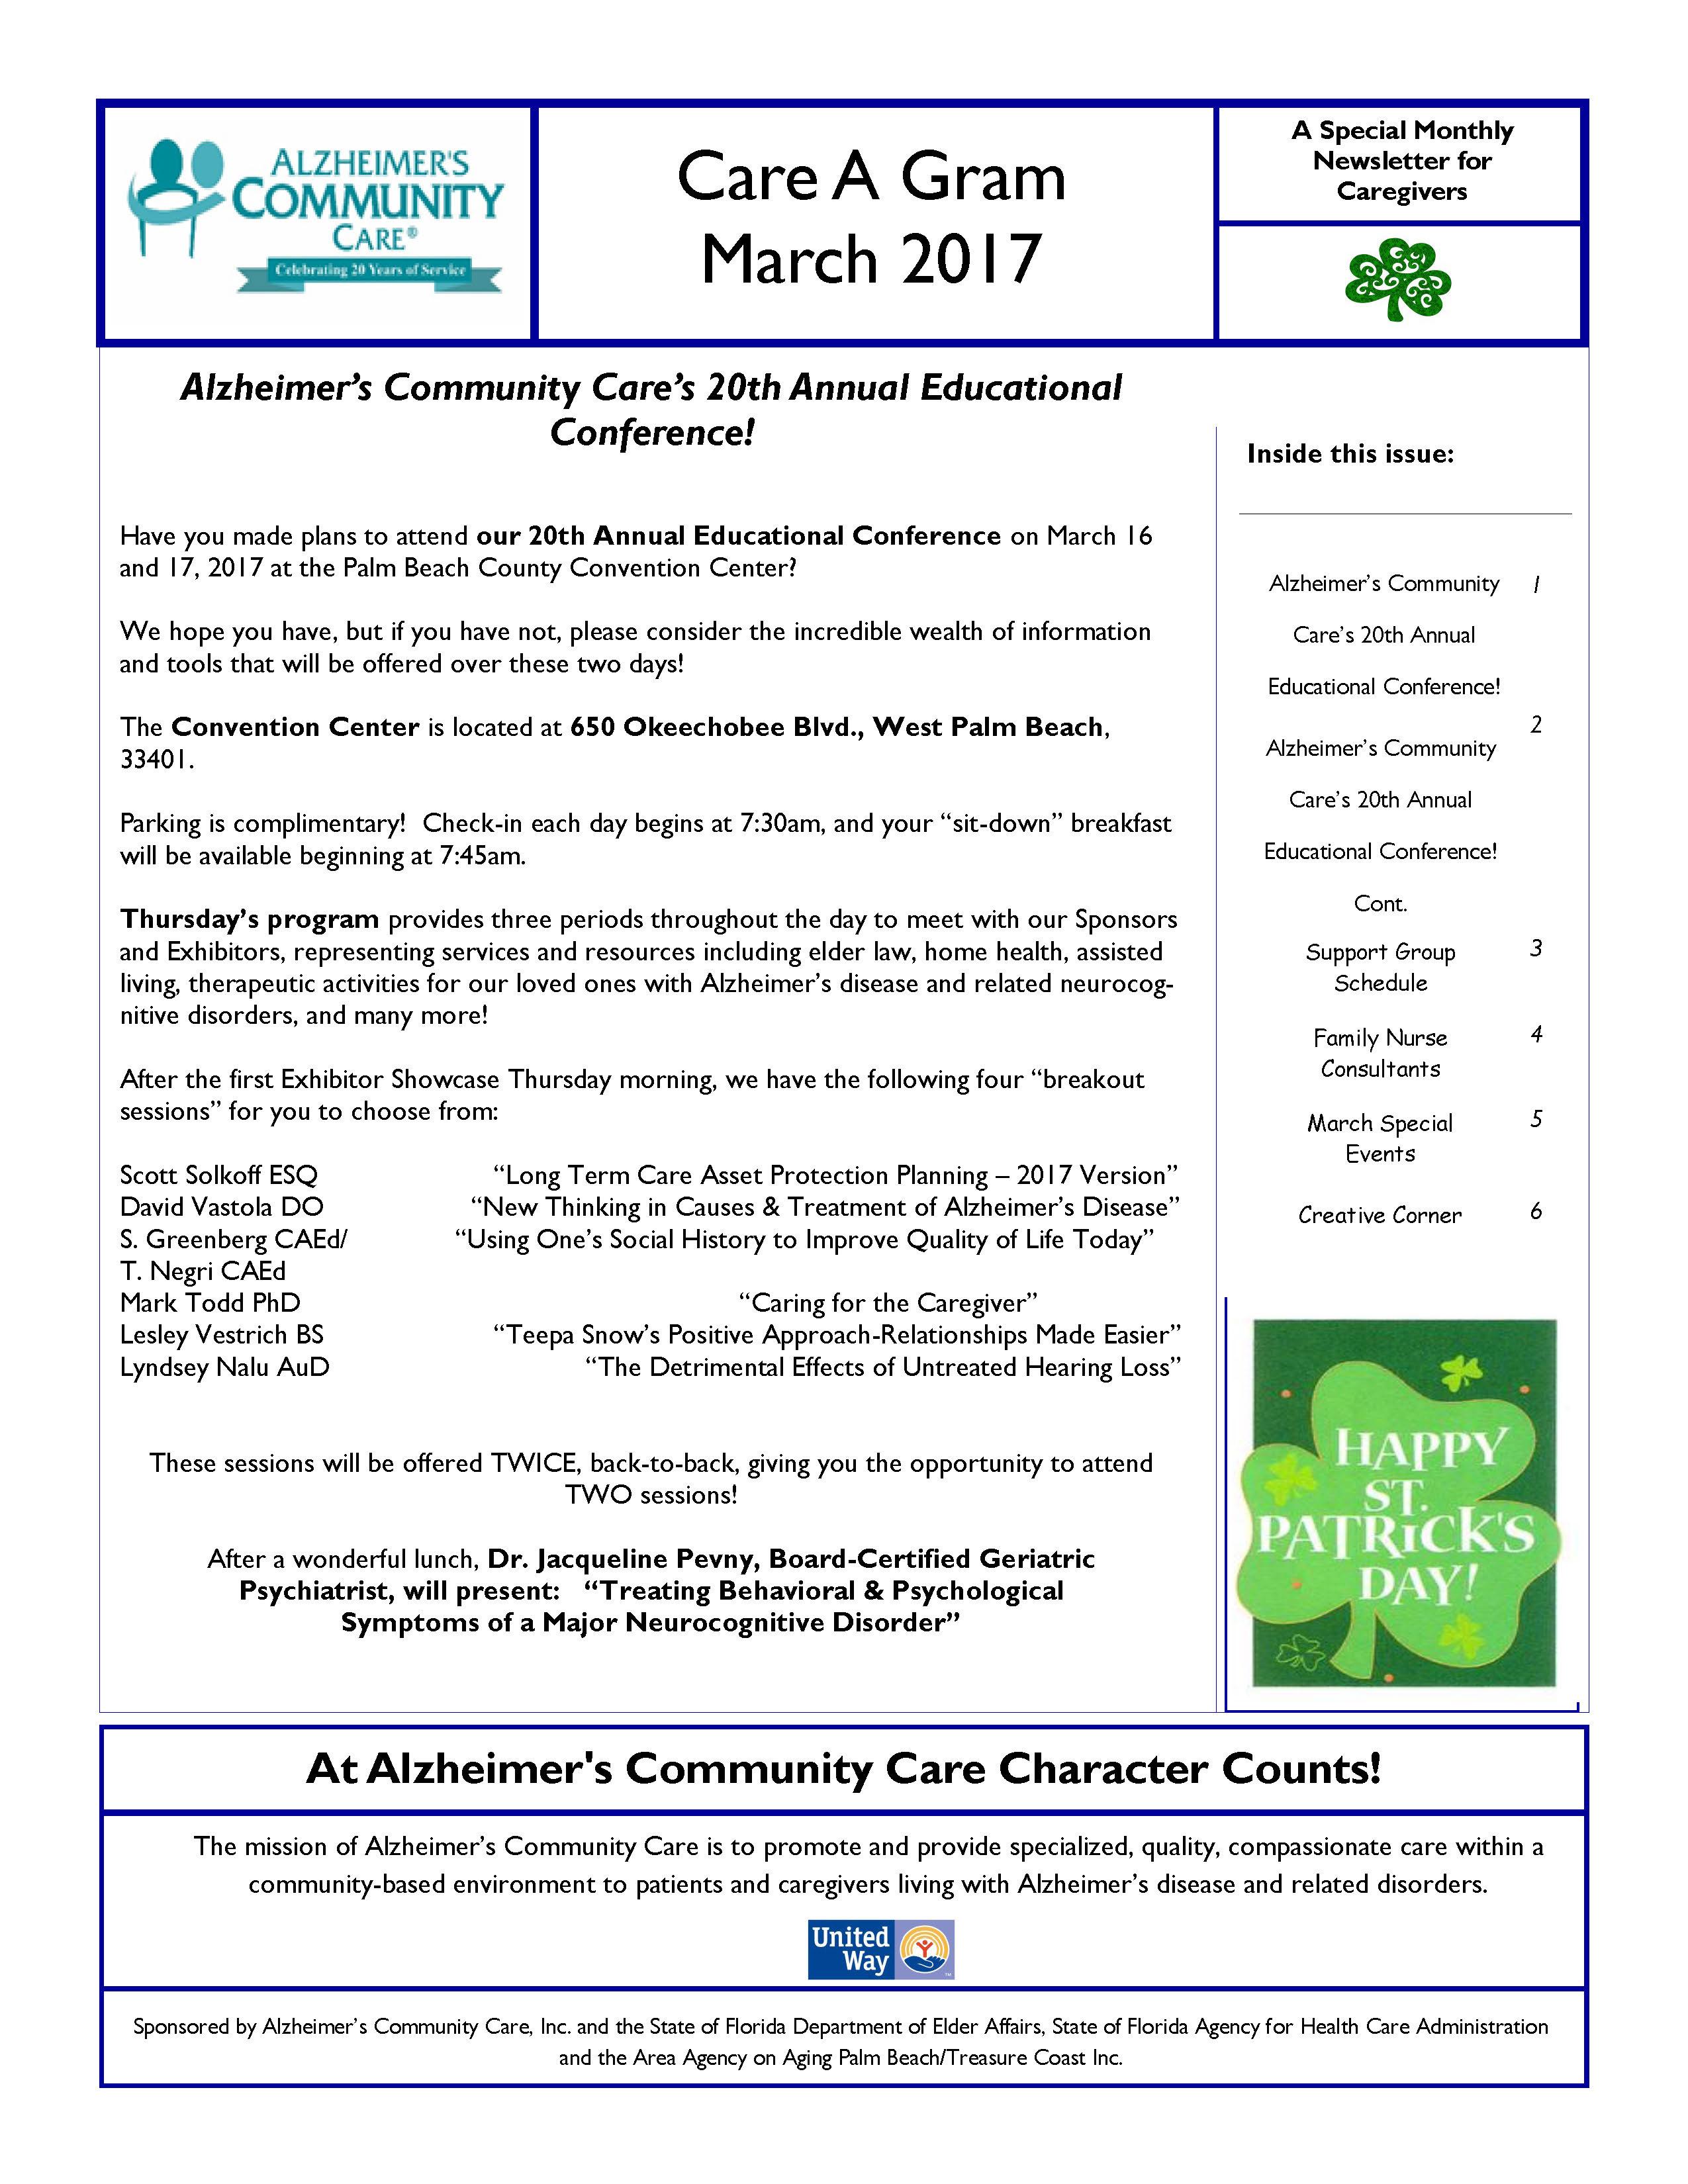 March 2017 Care A Gram